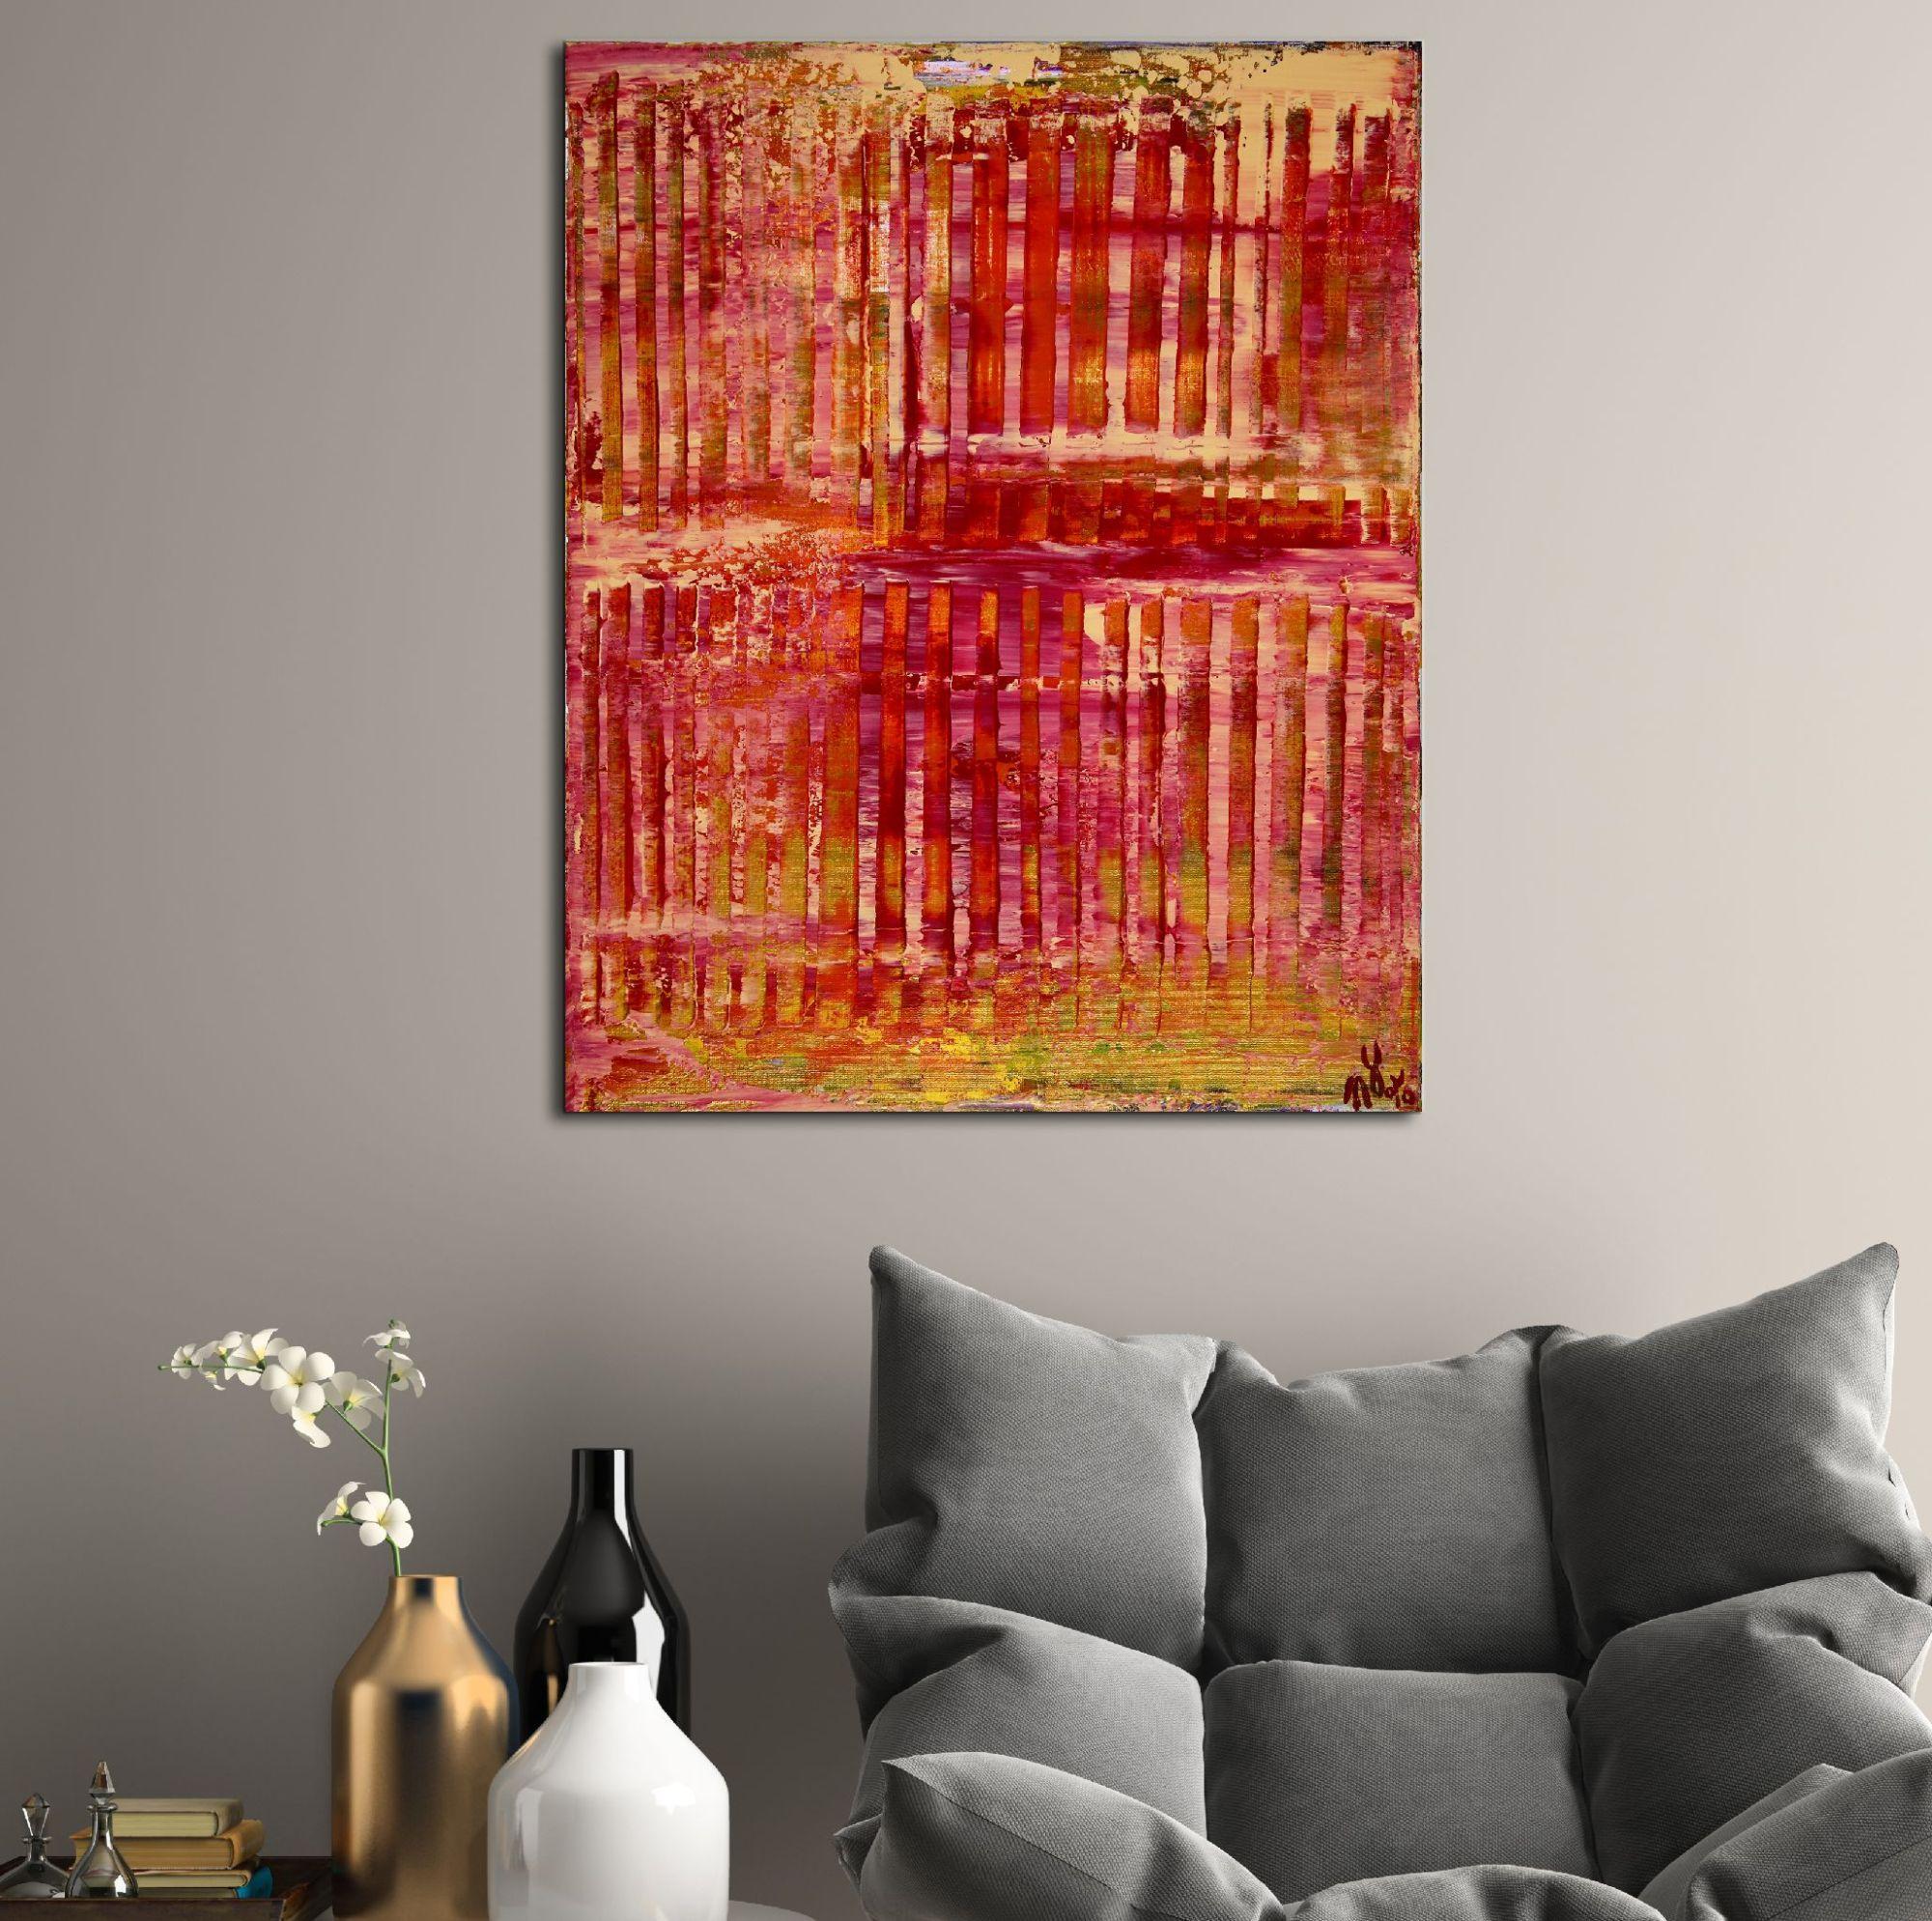 Sunset Intrusions (Orange Sky) by Nestor Toro